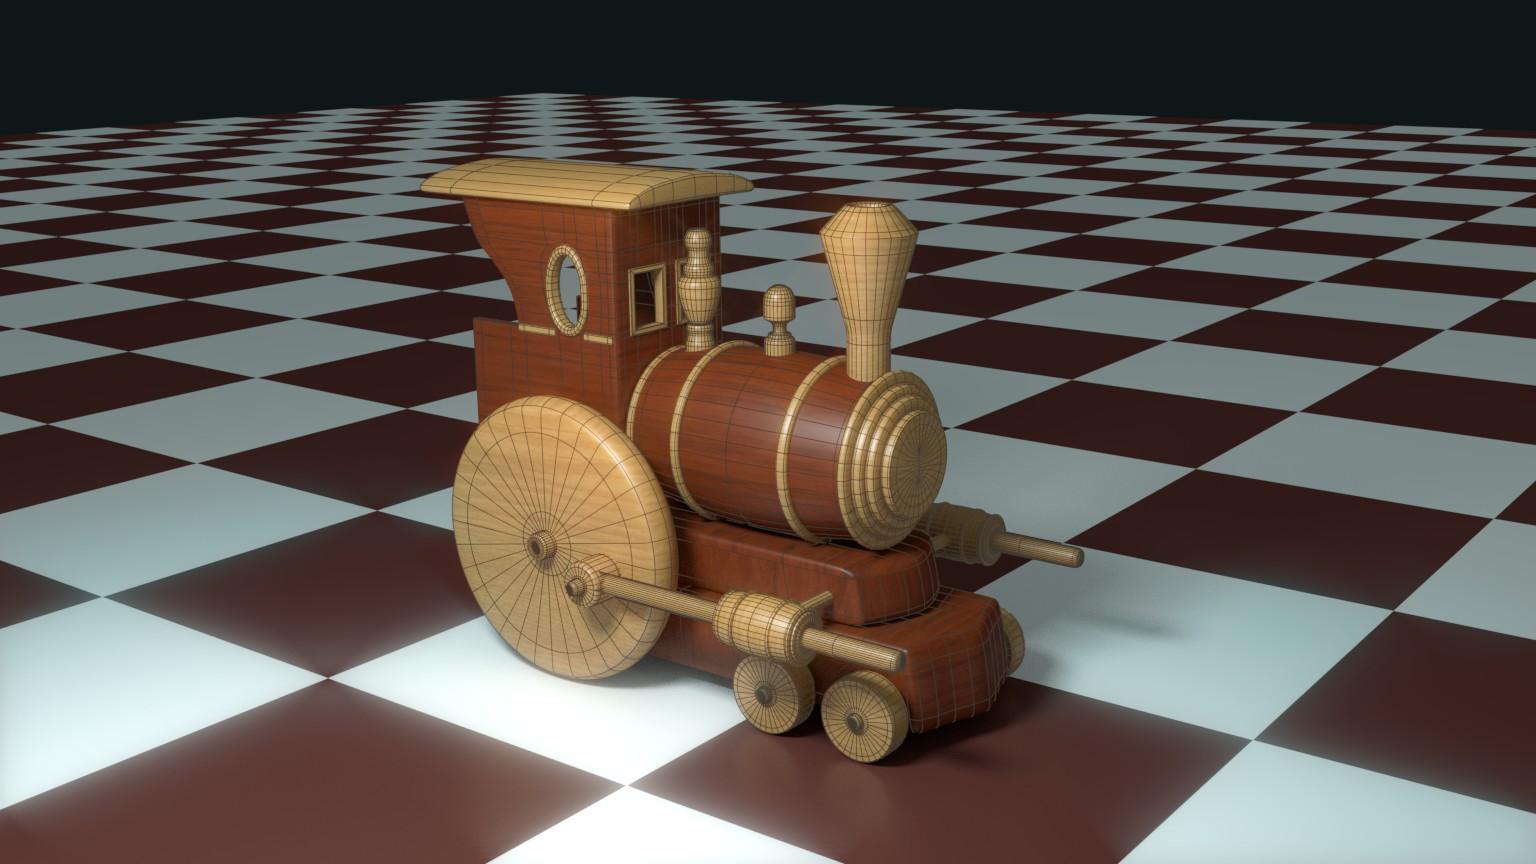 Tren madera juguete 2-trenecito_4.jpg